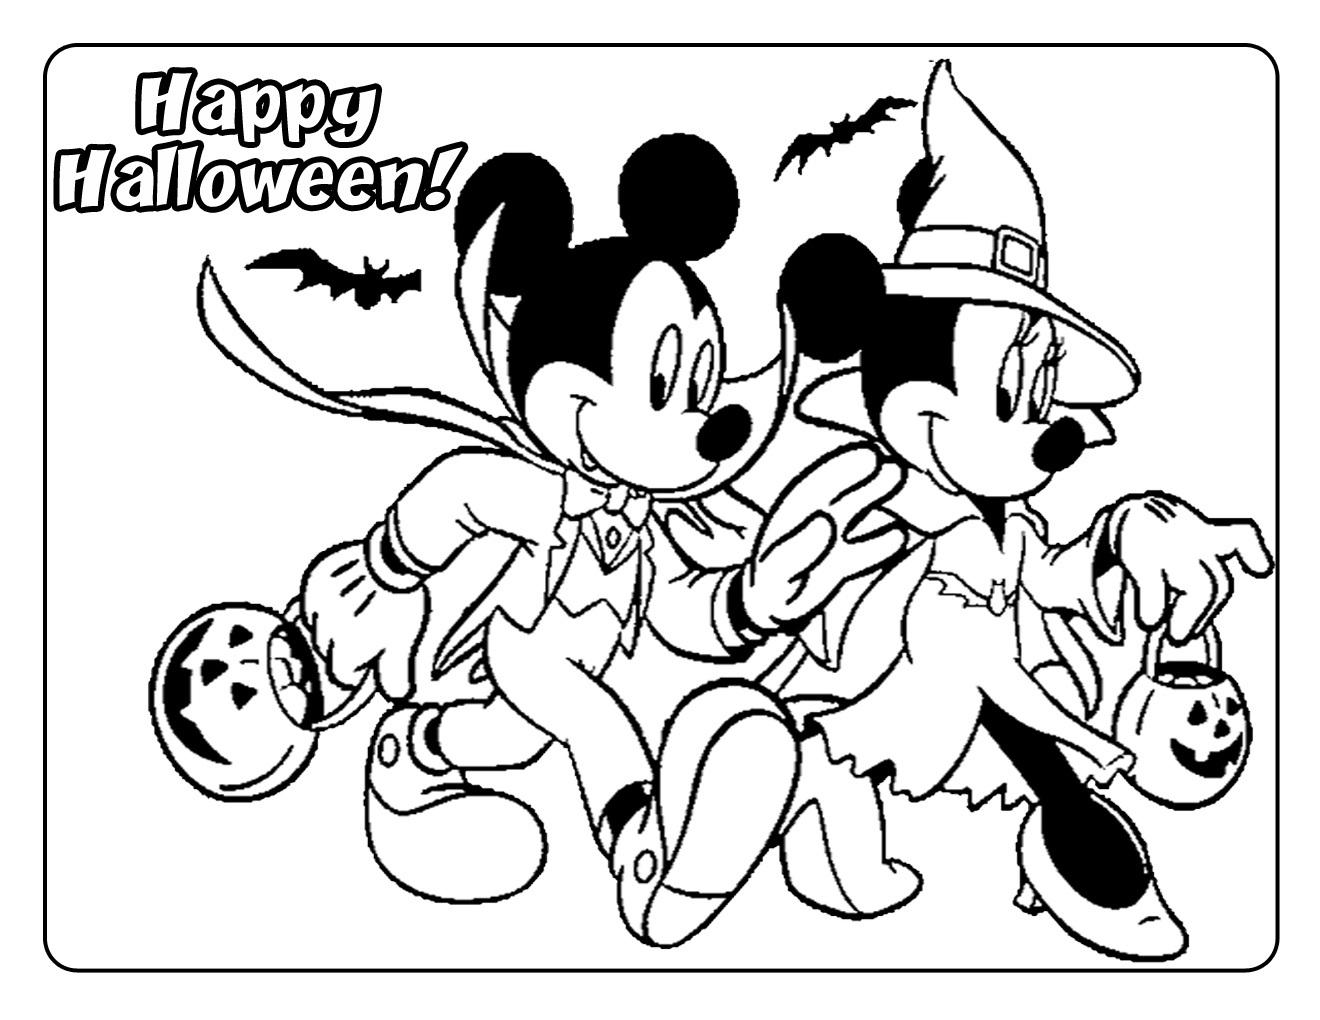 Halloween Themed Coloring Pages Democraciaejustica